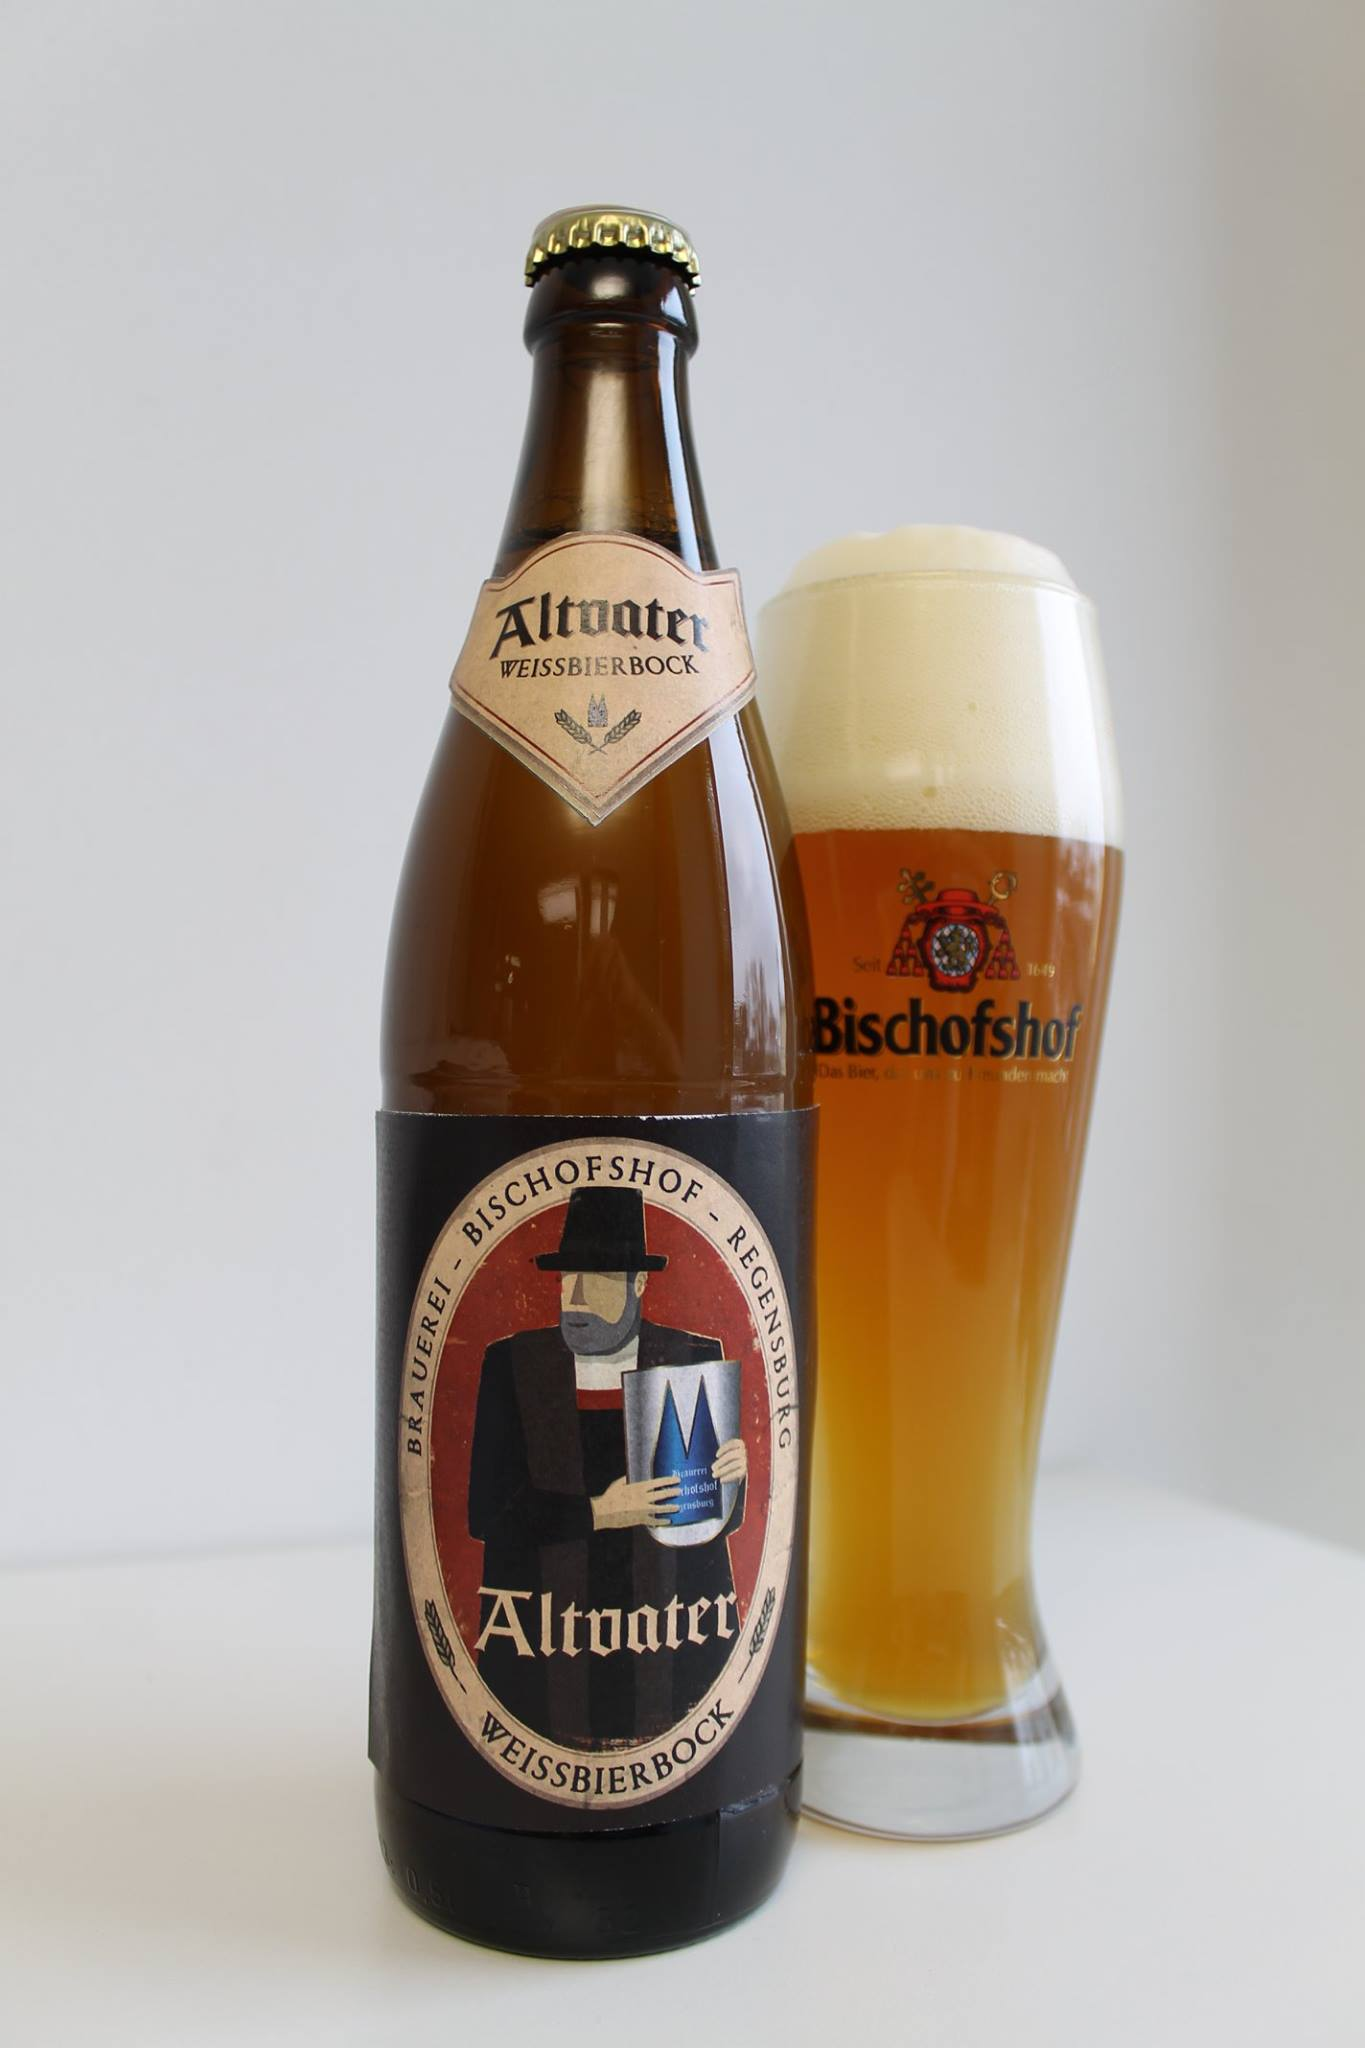 Bischofshof Altvater Weissbierbock